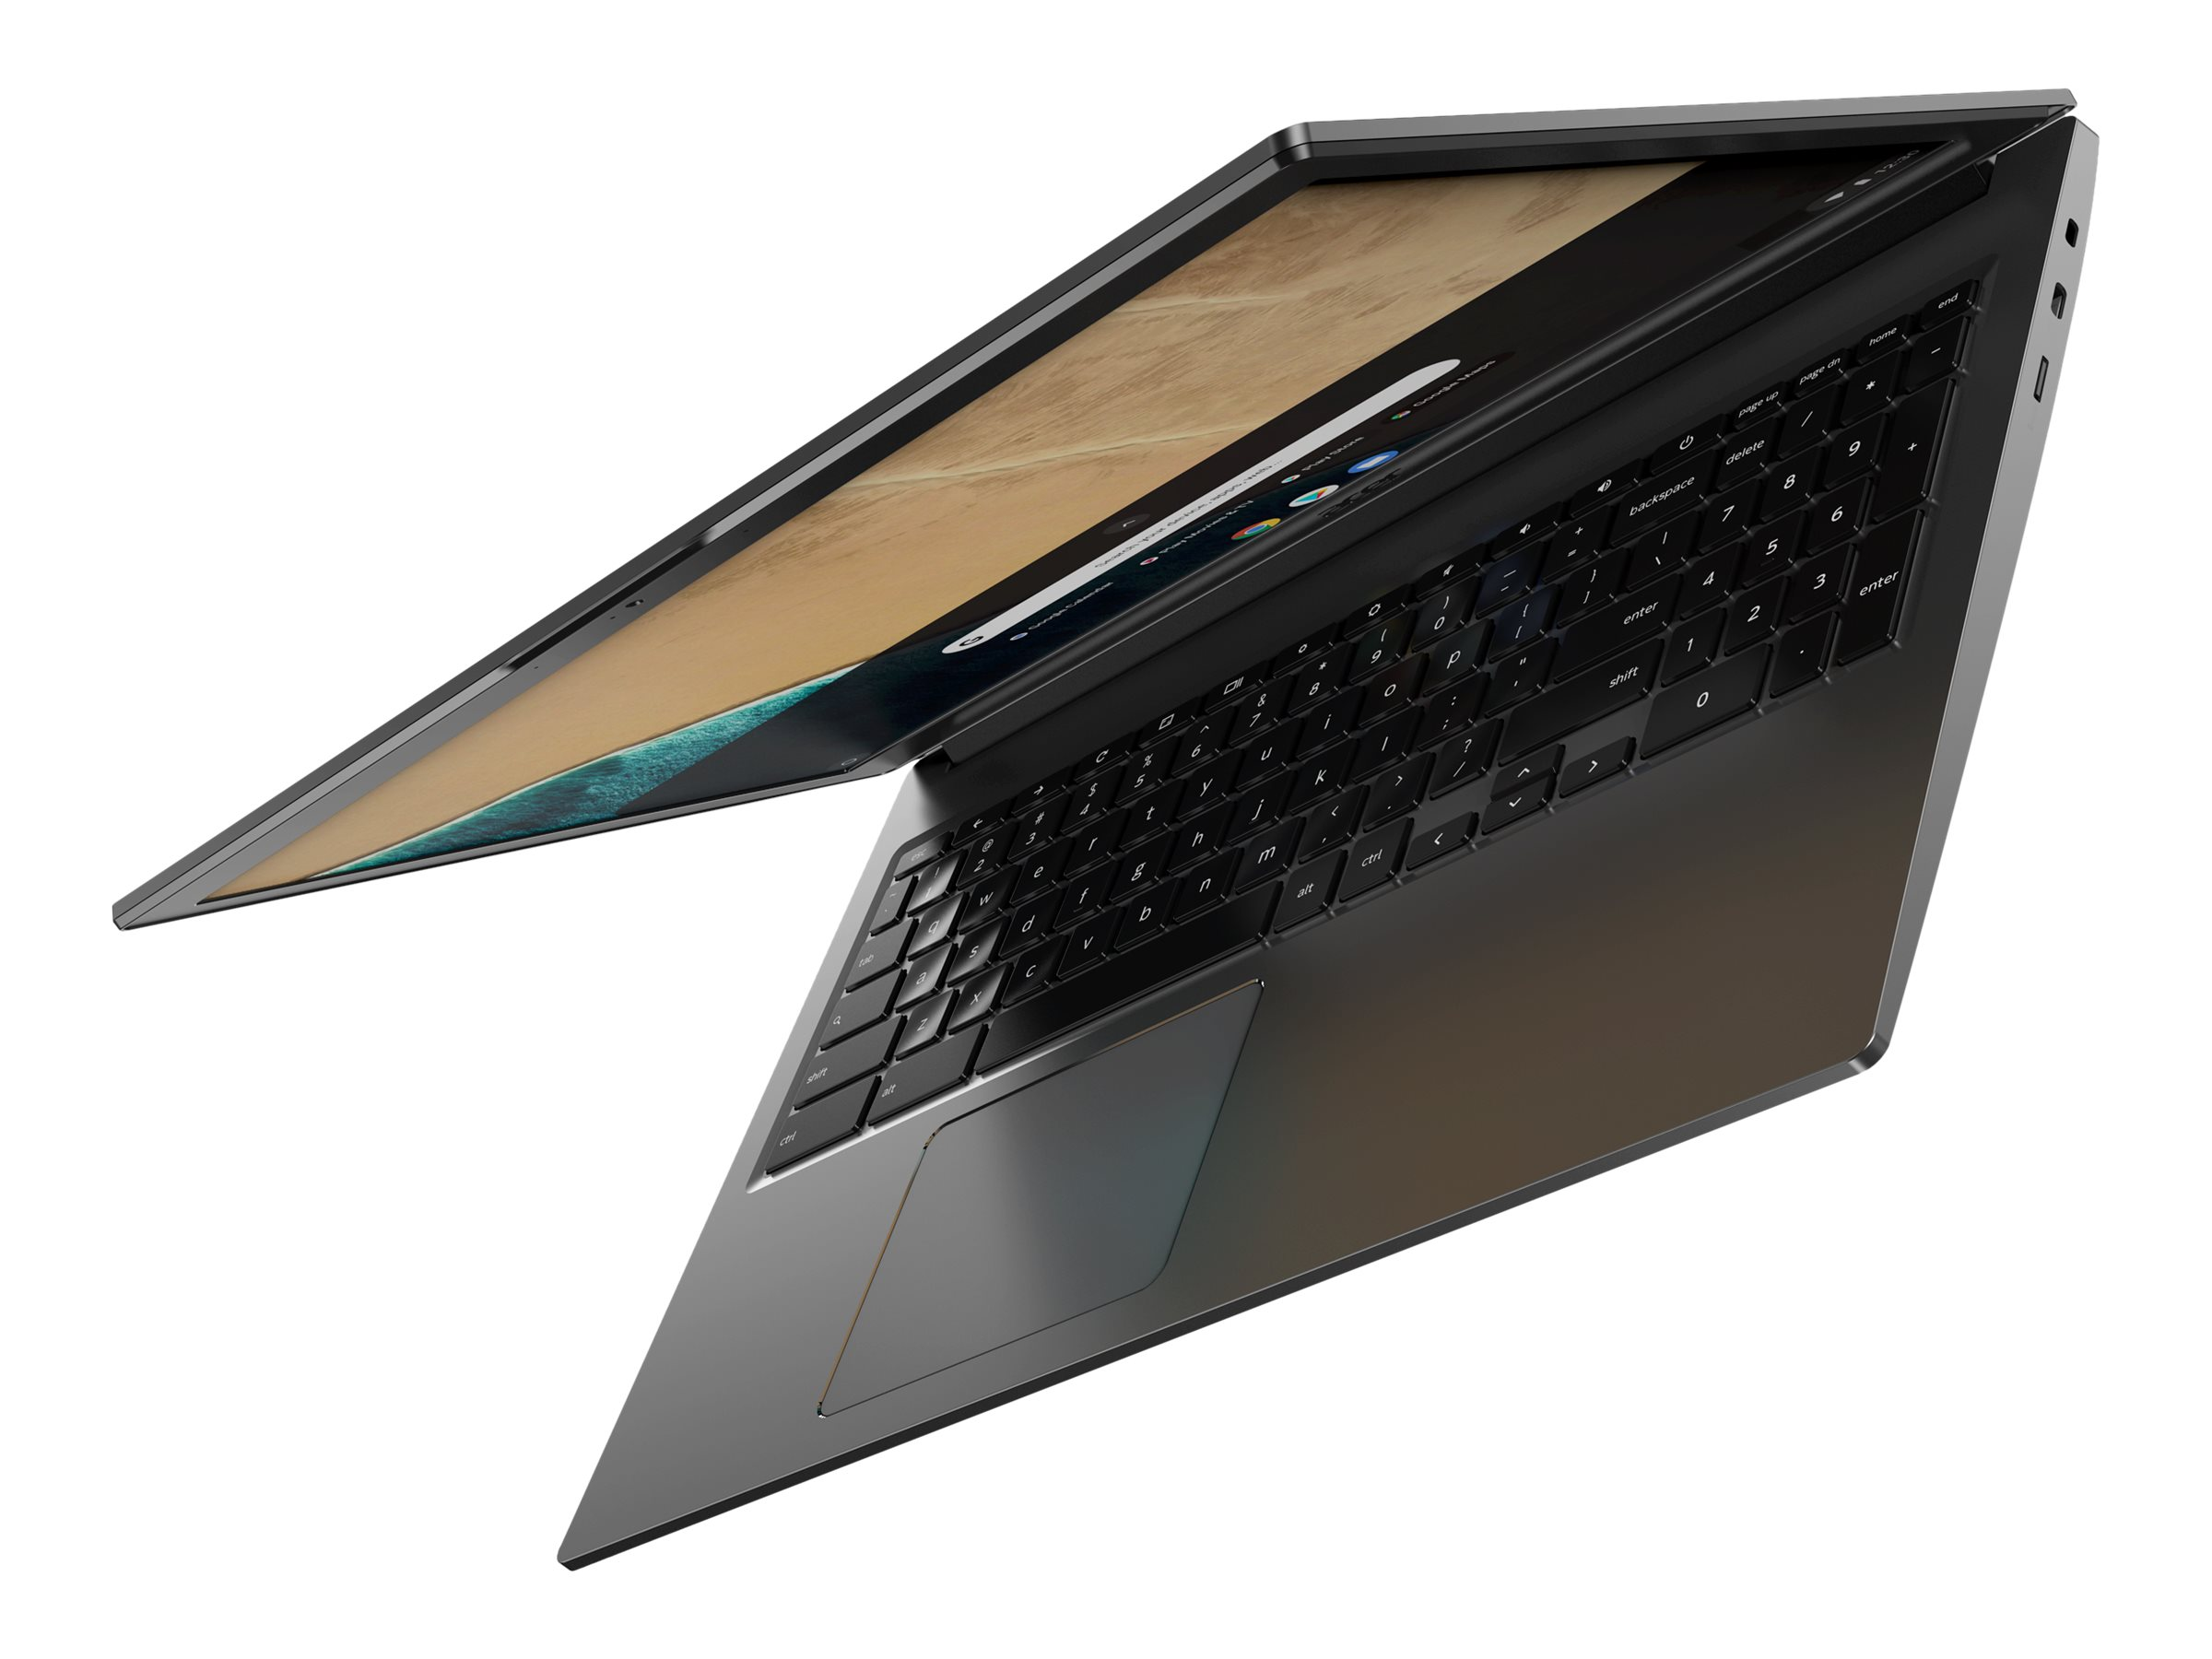 Acer Chromebook 715 CB715-1W-33B9 - 15.6